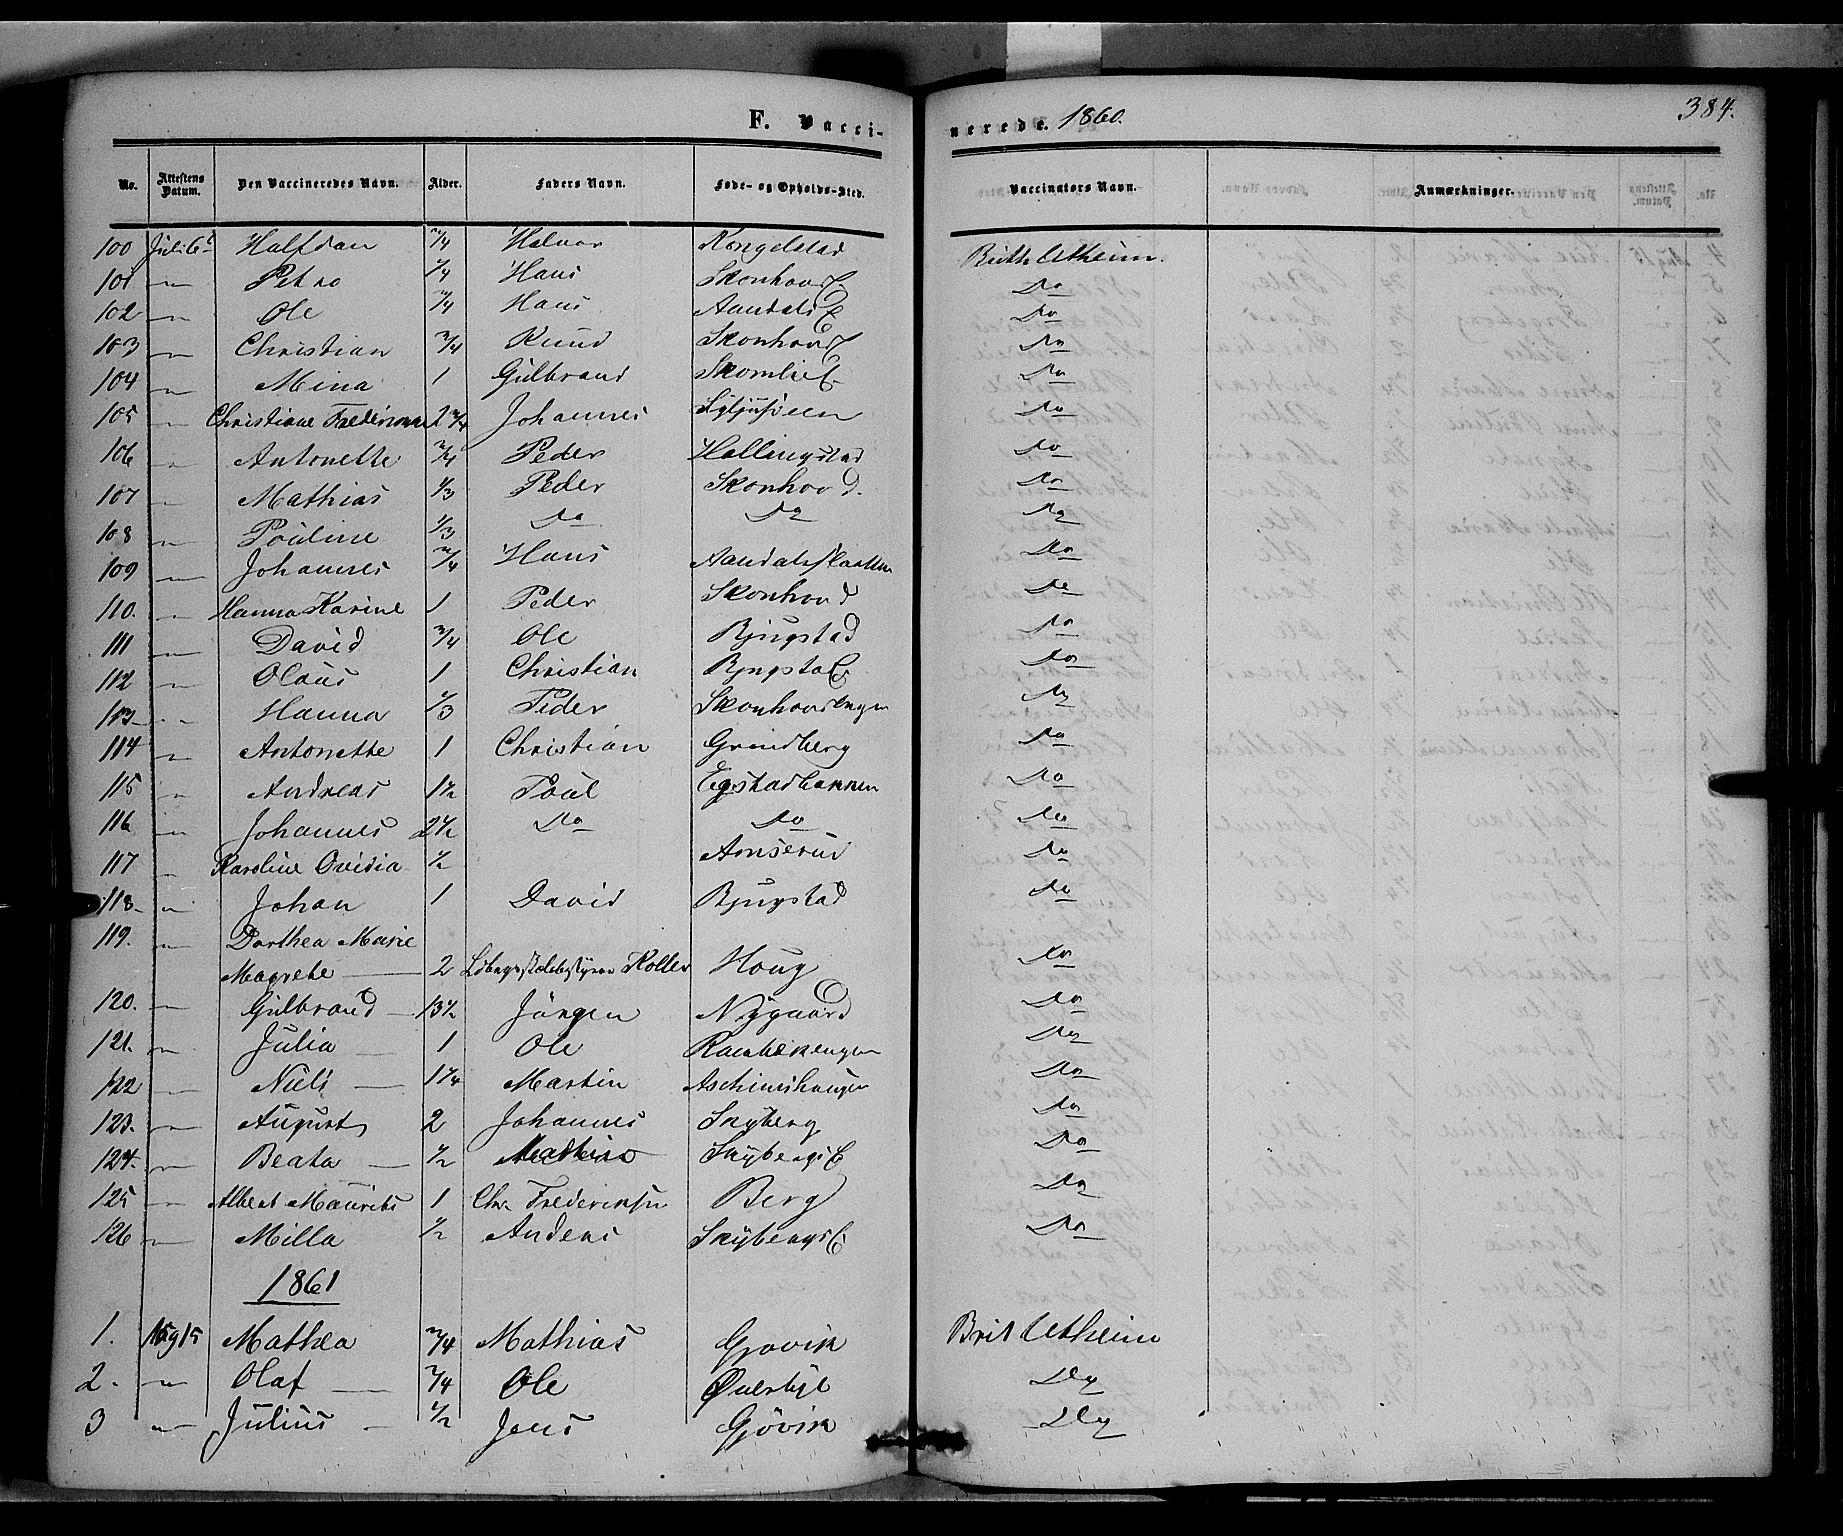 SAH, Vardal prestekontor, H/Ha/Haa/L0006: Ministerialbok nr. 6, 1854-1866, s. 384